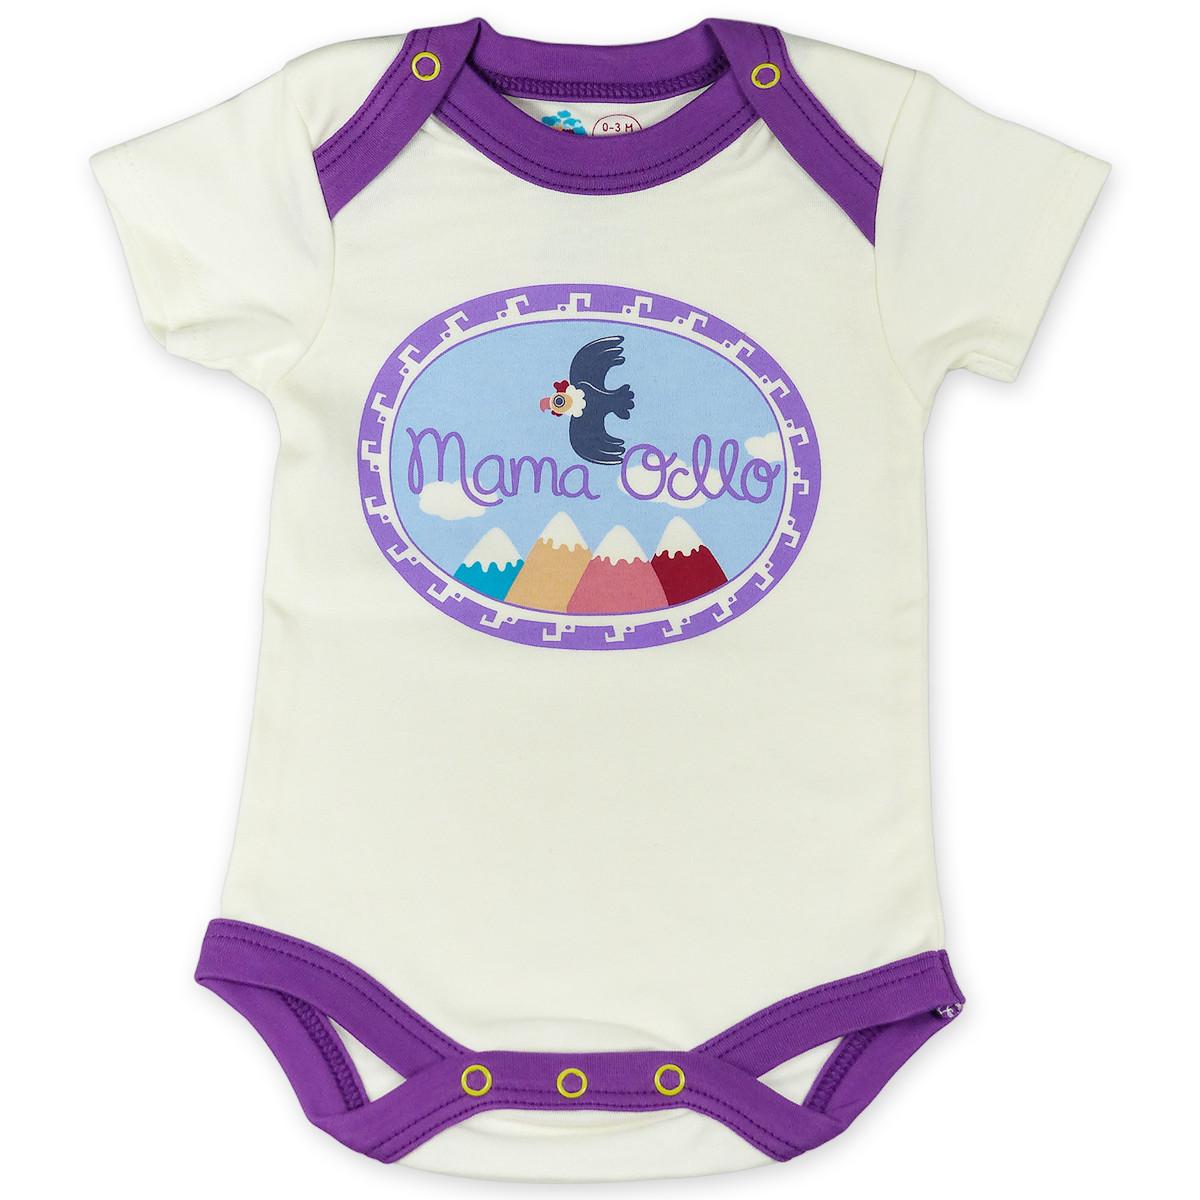 Chill n Feel - Kurzarm Baby-Body Kondor in Premium Pima Qualität Weiß Pflaume (1)